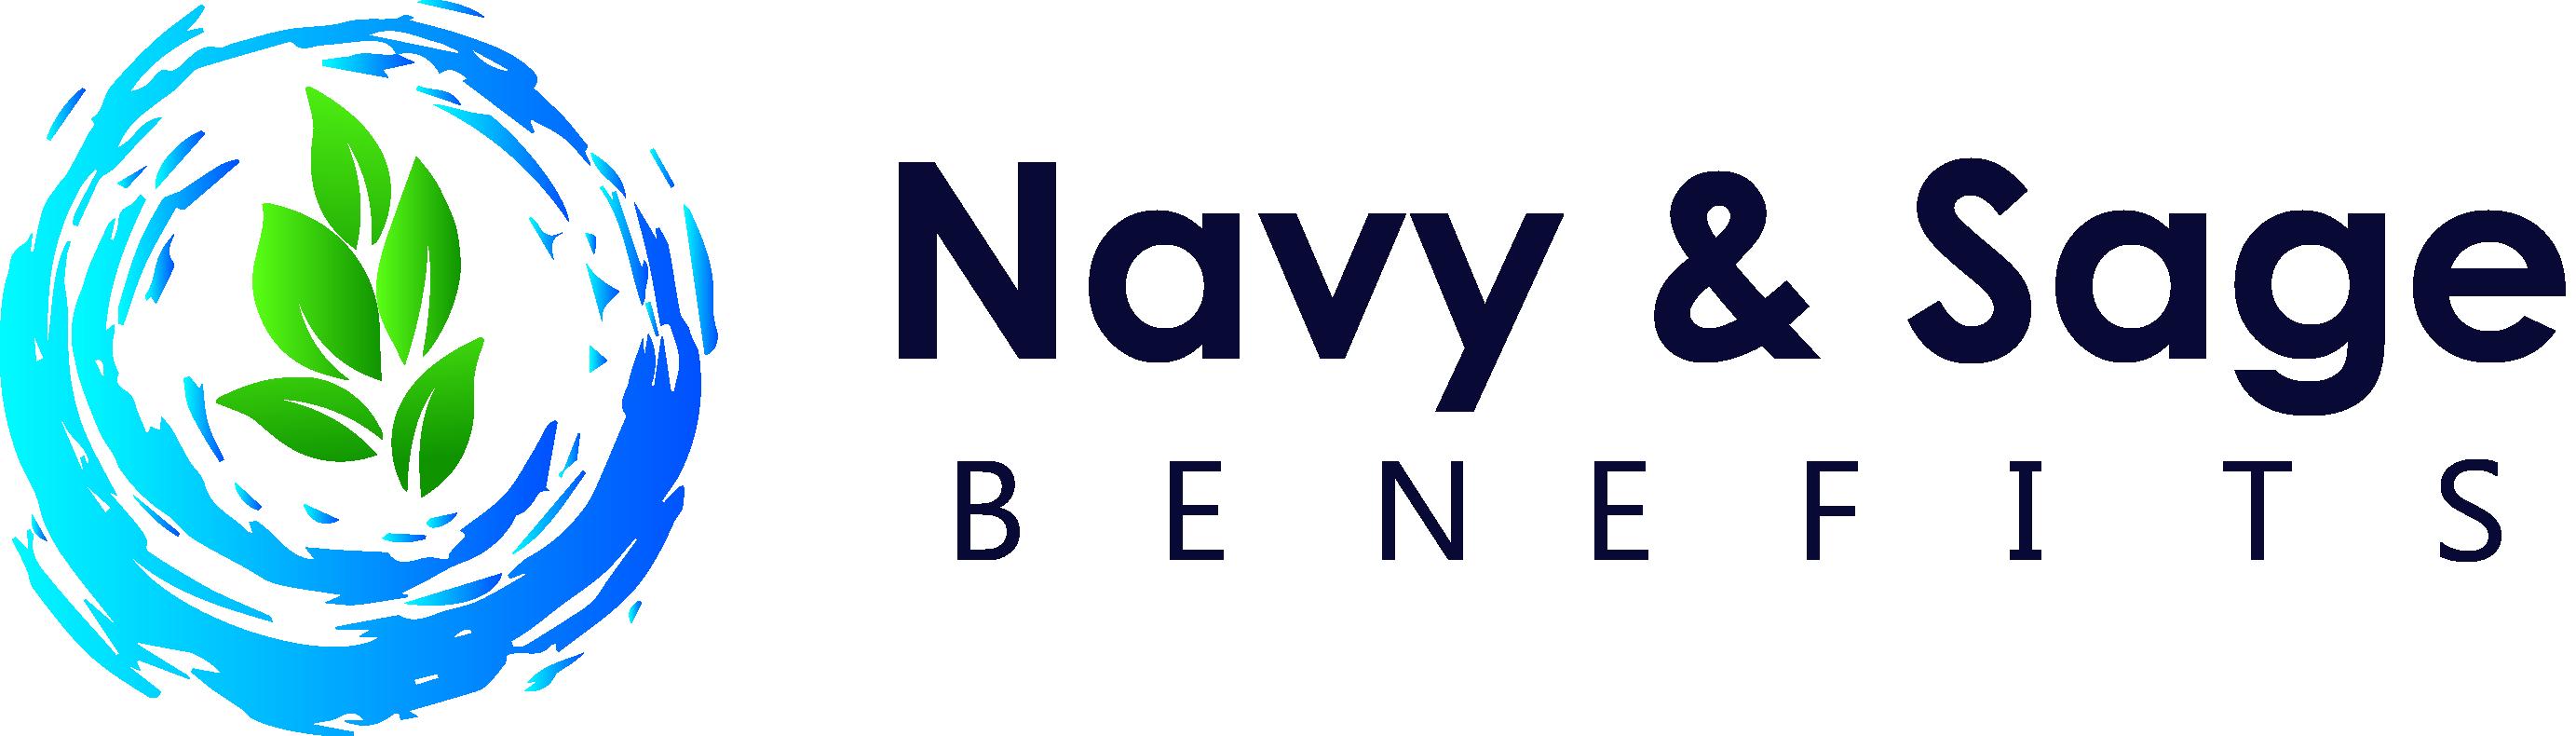 Navy & Sage Benefits